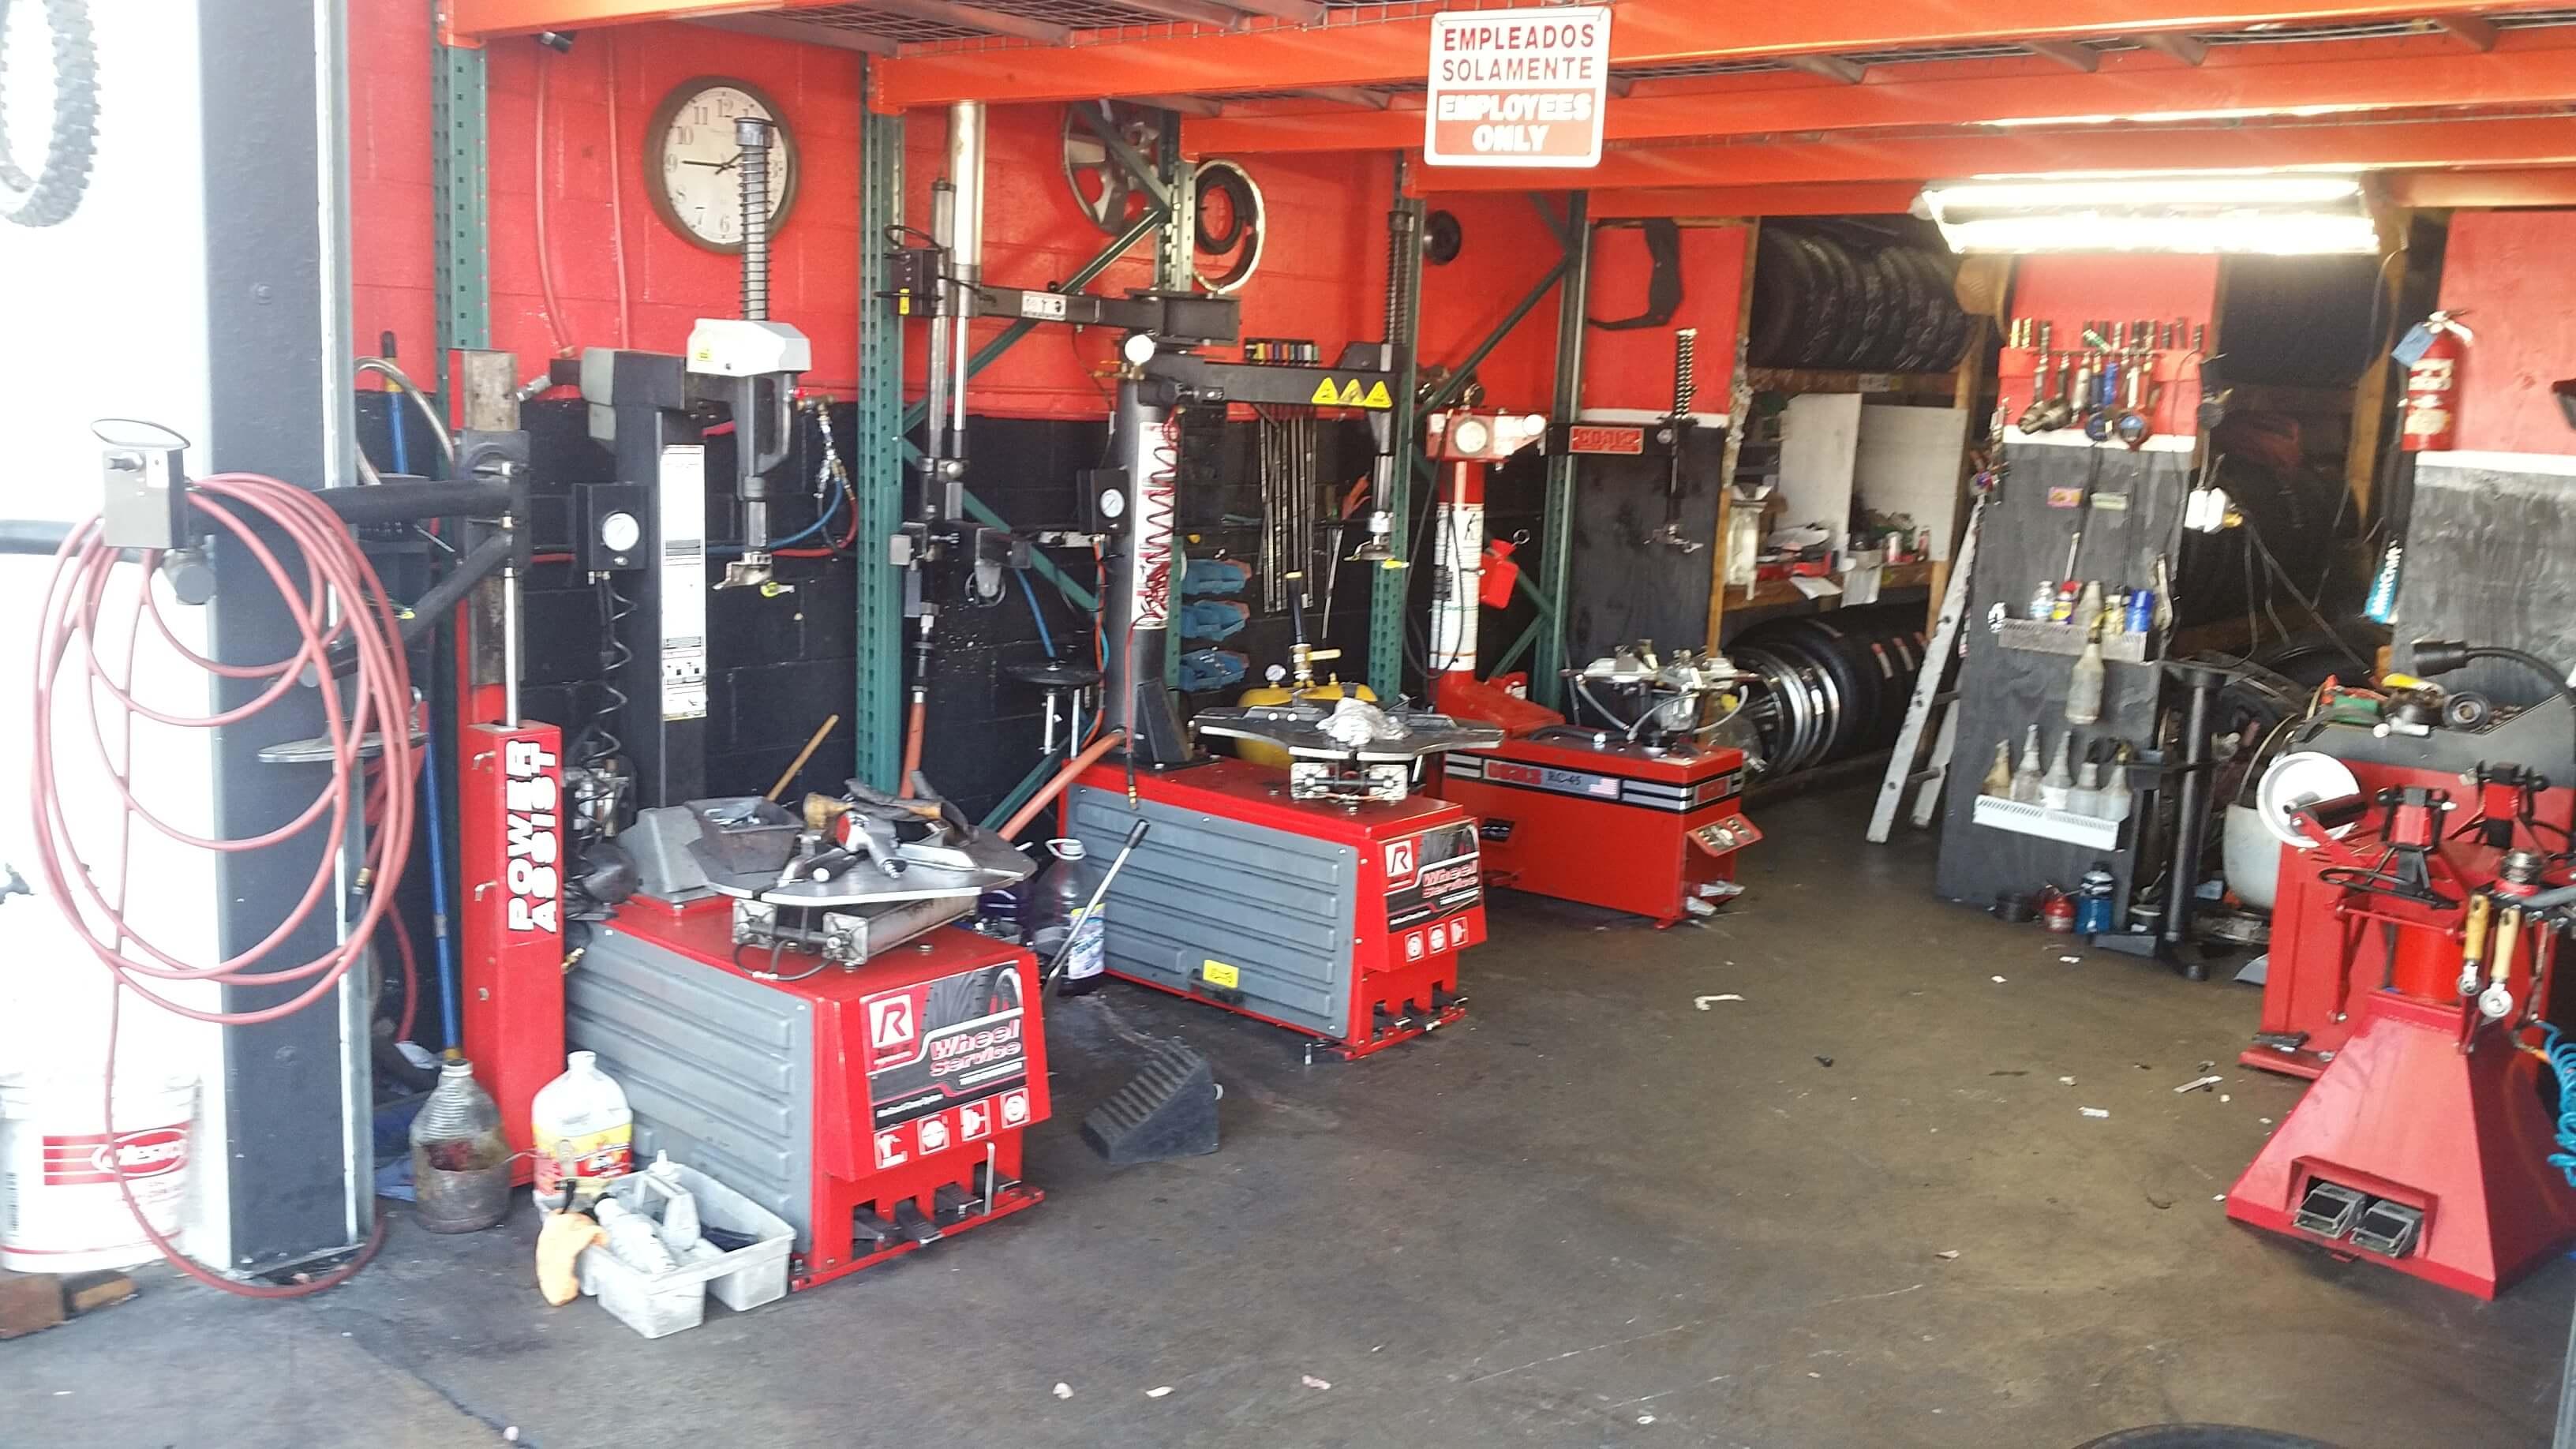 Tire Shops Near Me Open On Sunday >> Corona Tires New Used 1359 W 6th St Ste B Corona Ca